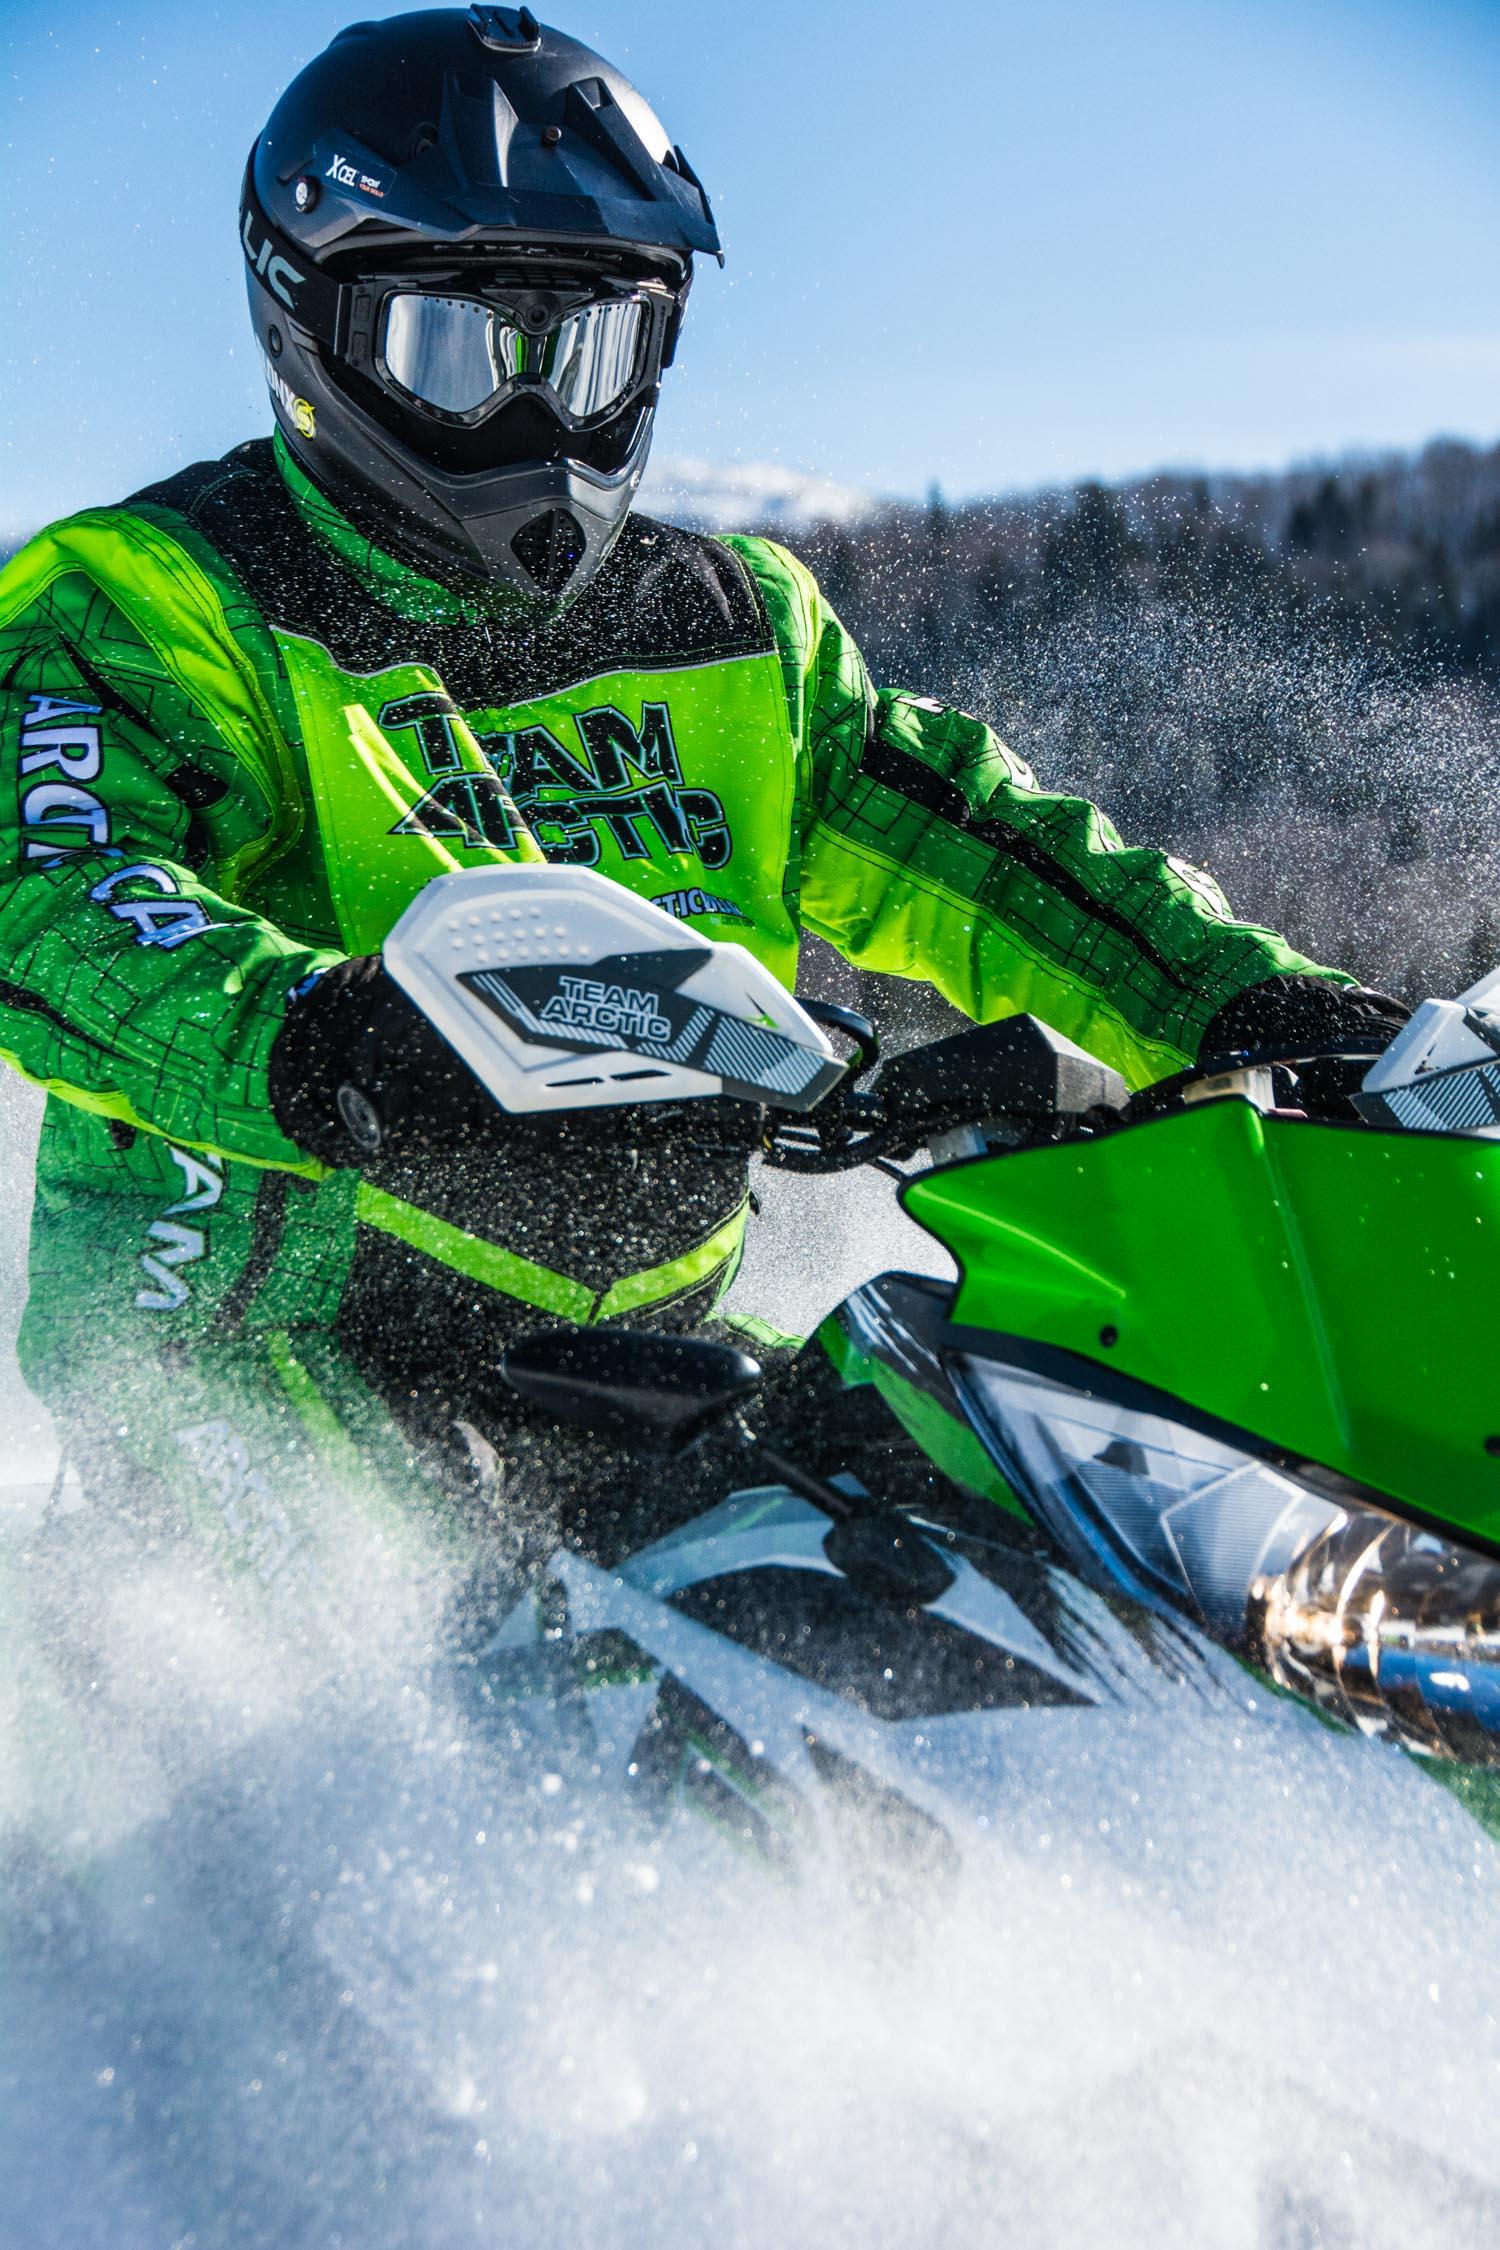 feb10-11 2015-Tourism New Brunswick-T4G Kick-winter 2015-New Brunswick Great Northern Odyssey-snowmobile trip-Mount Carleton-NB-photo by Aaron McKenzie Fraser-www.amfraser.com-_AMF4580.jpg